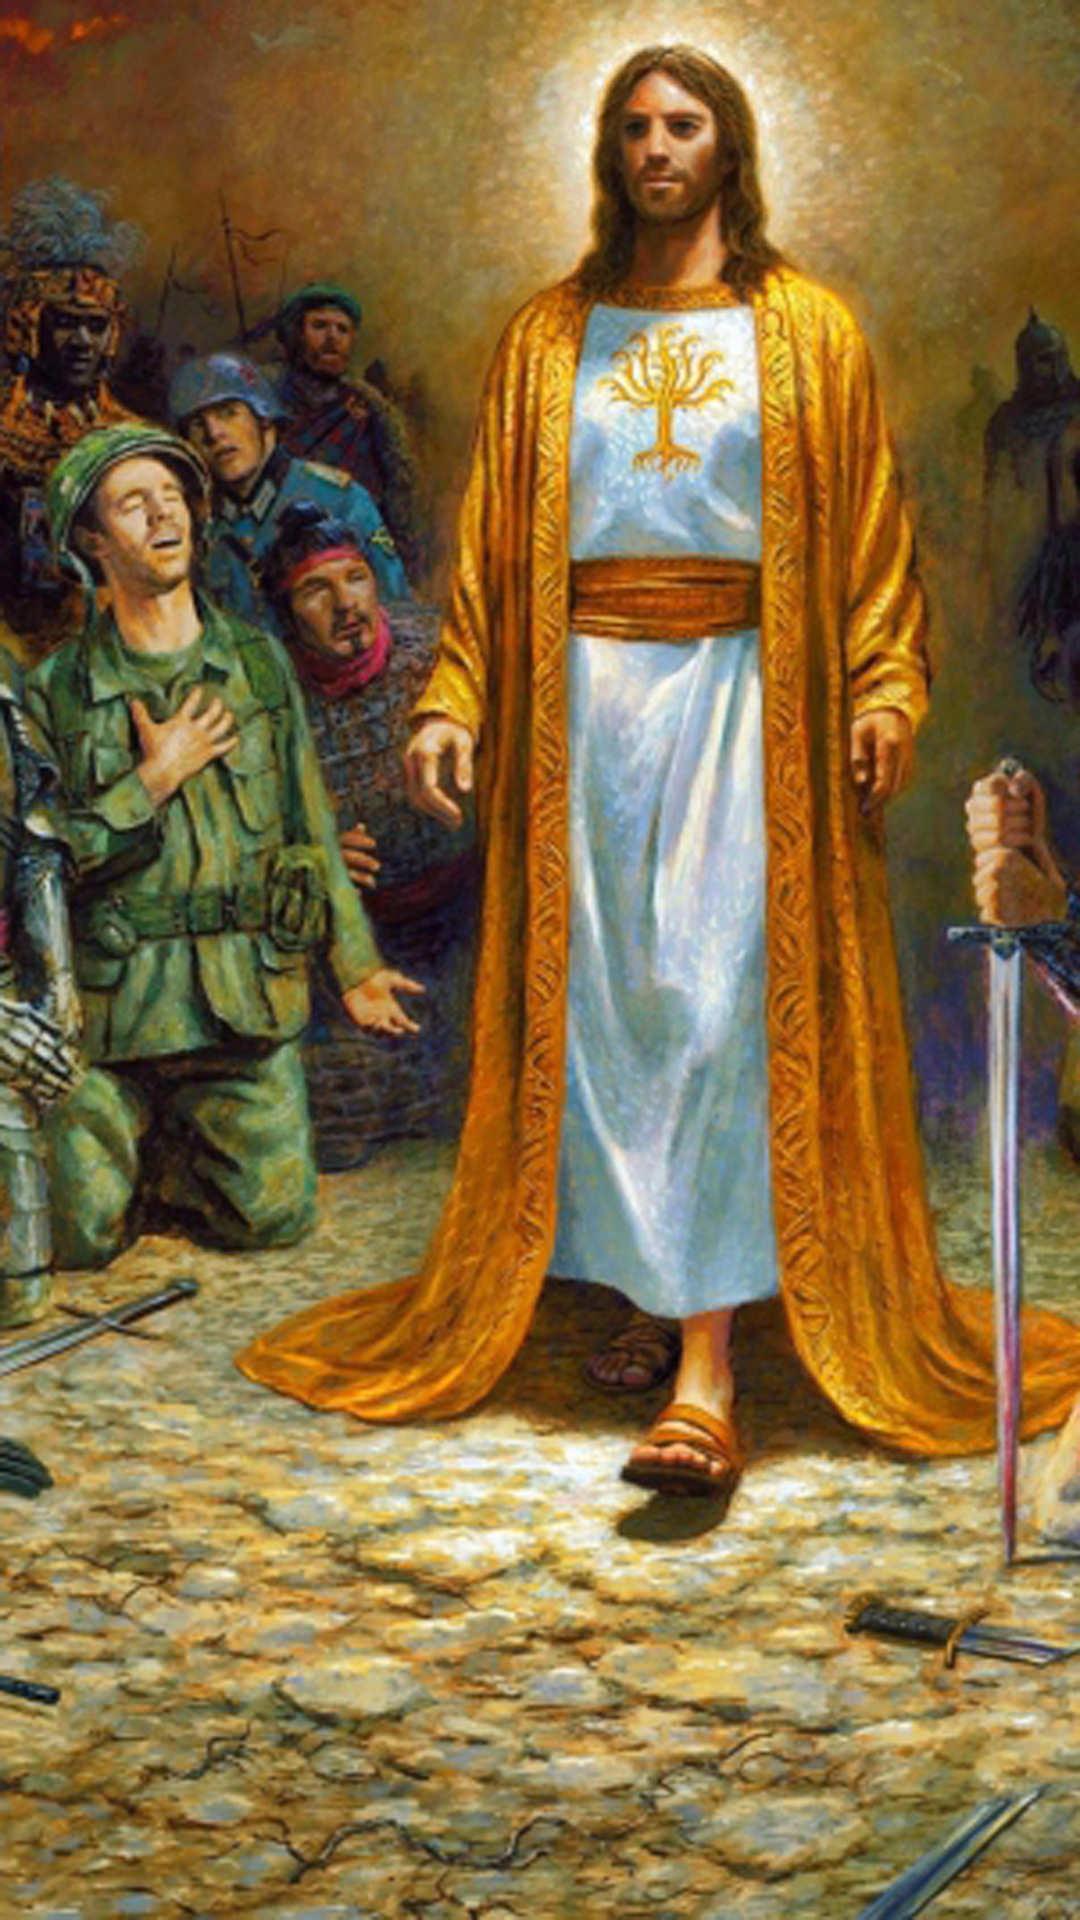 Jesus Wallpapers For Mobile Phones Wallpaper Cave